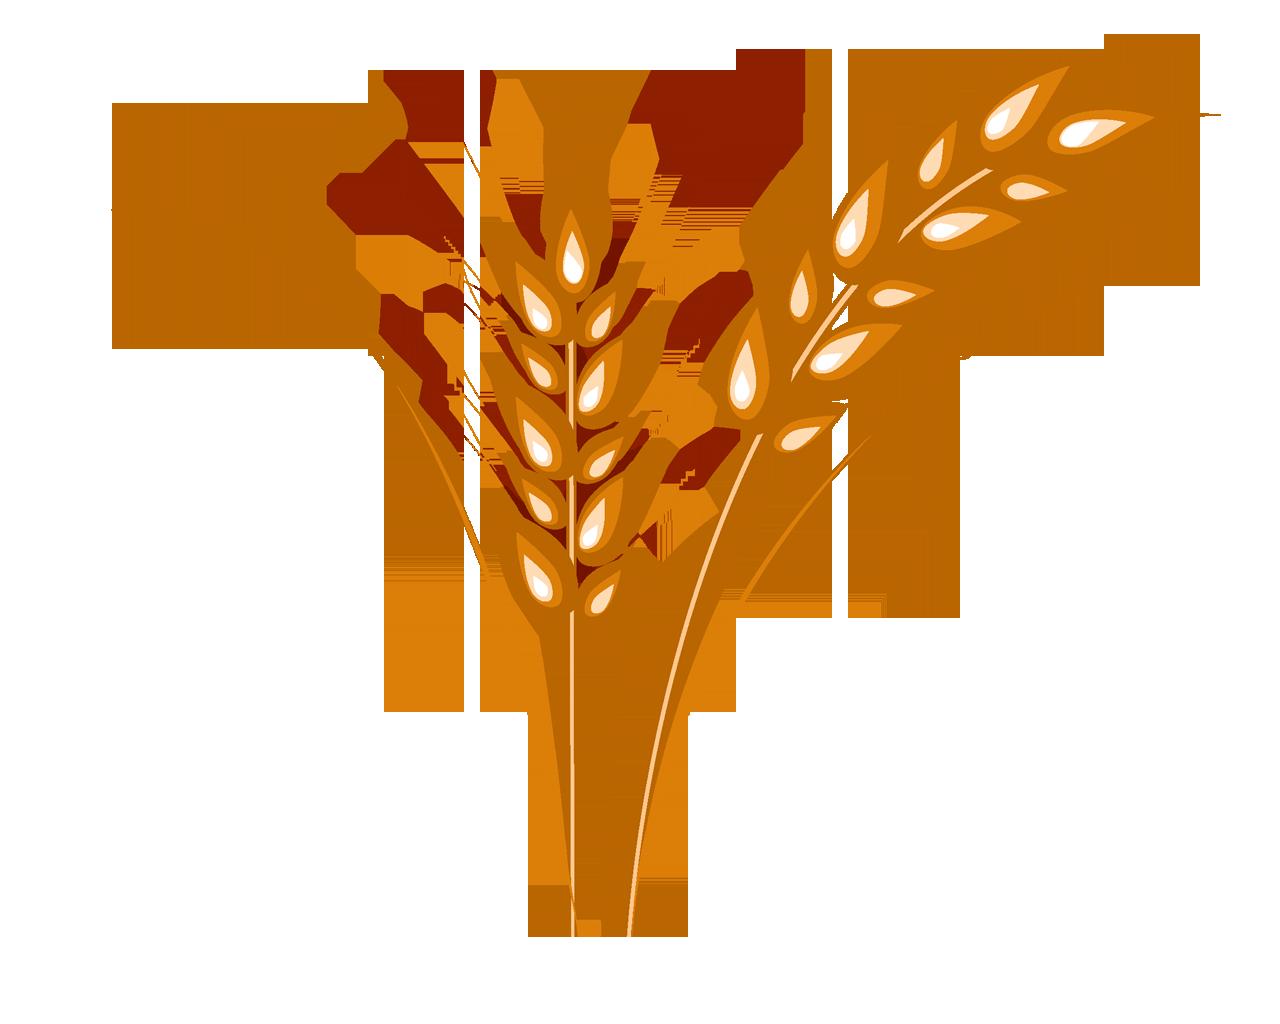 Grain clipart barley. Wheat png image purepng